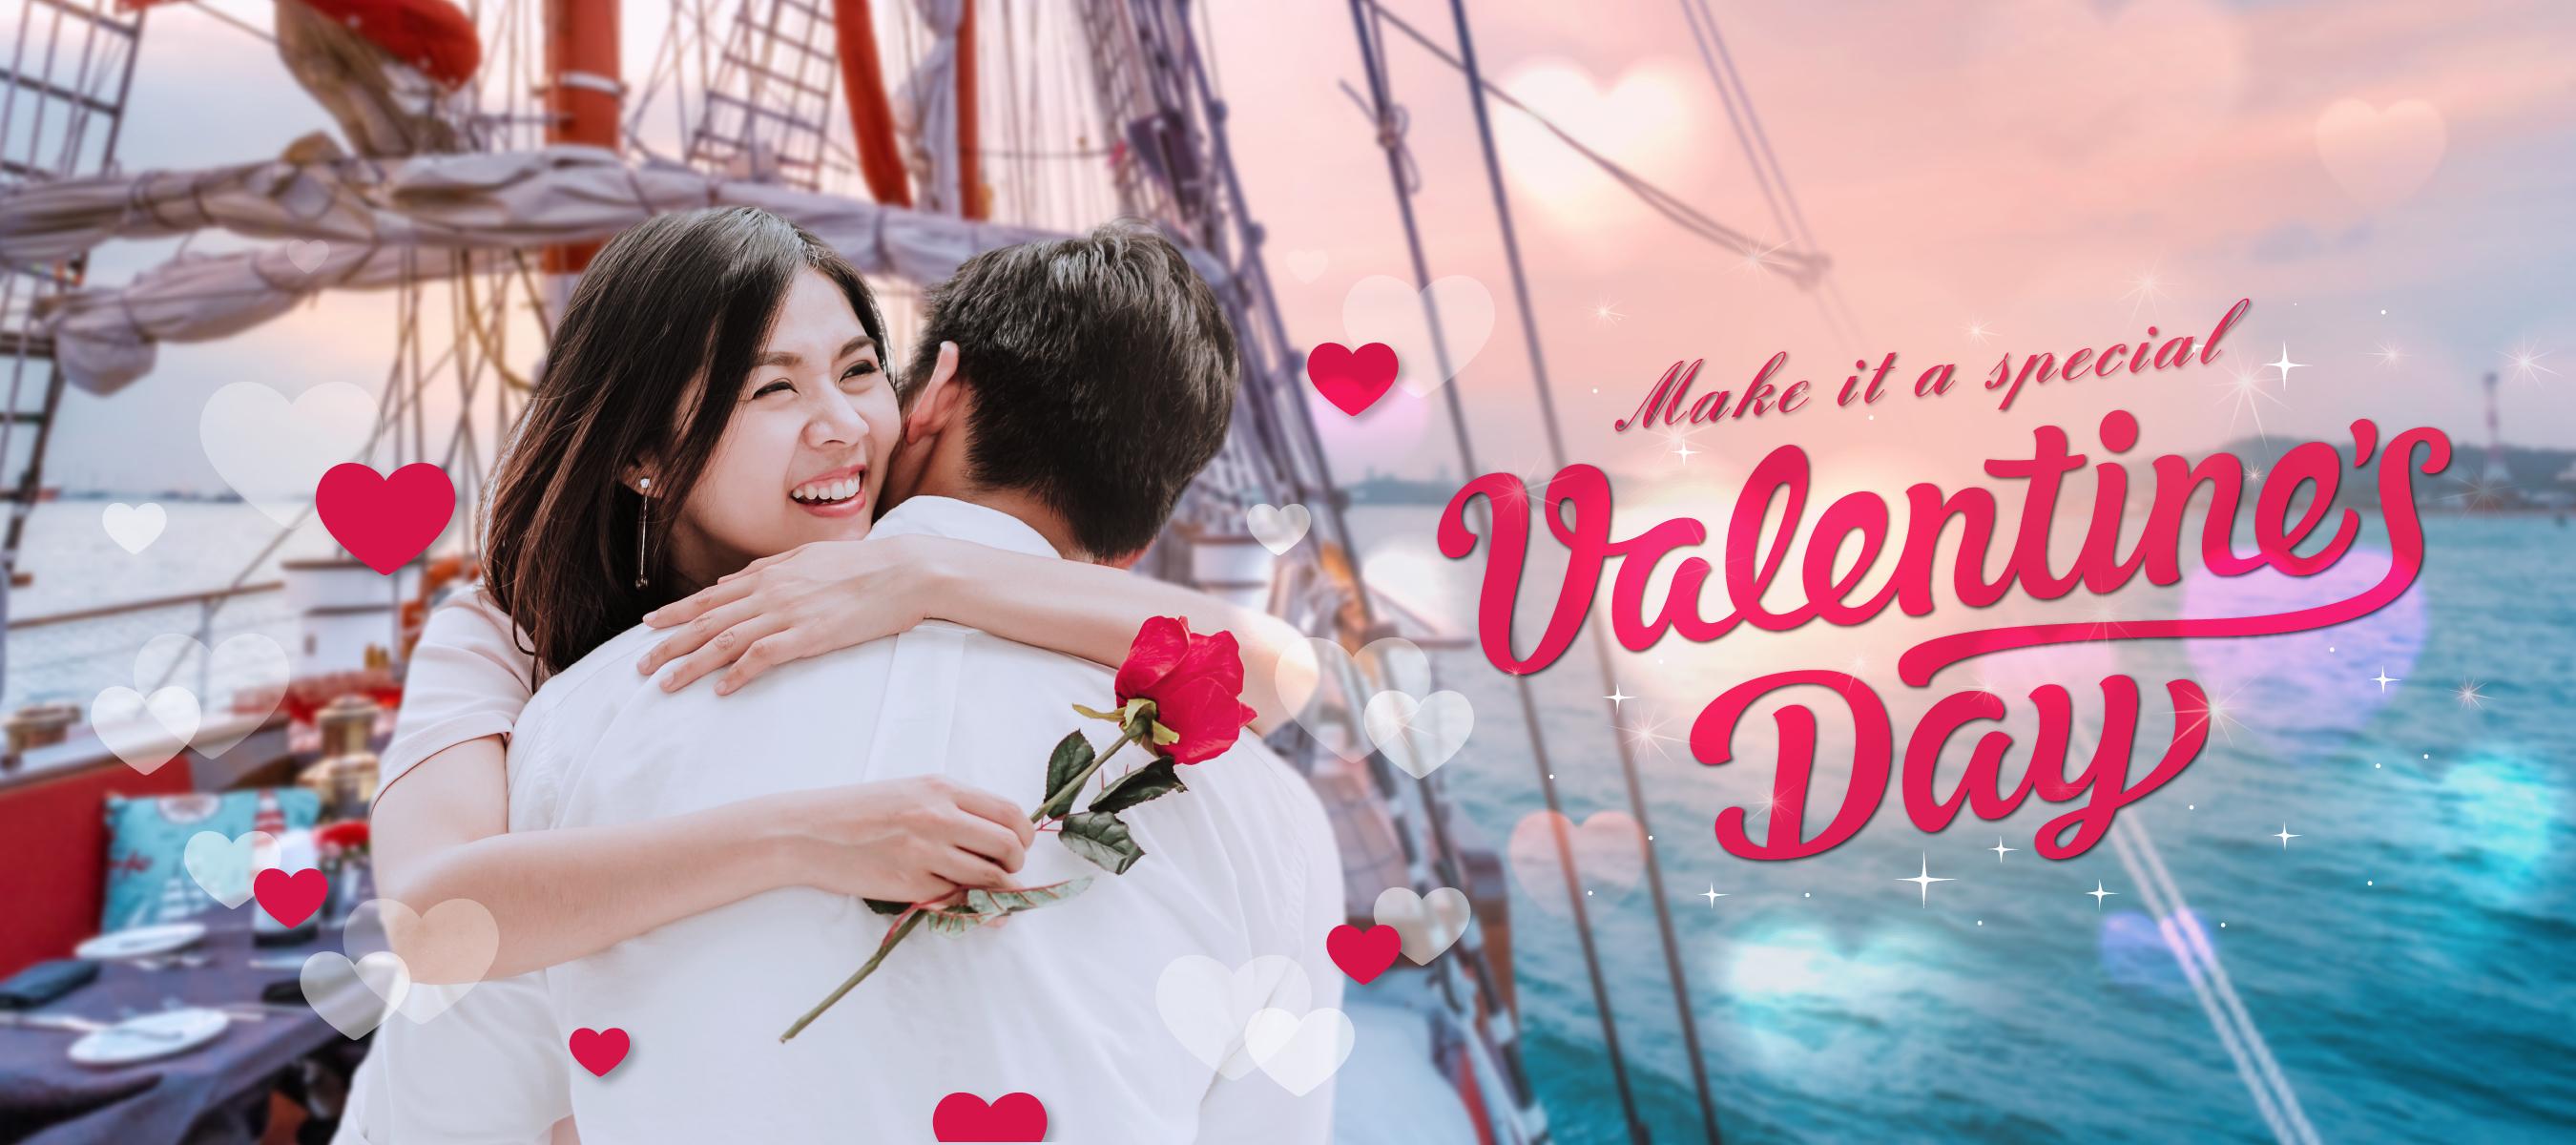 ValentineDayKV2021_2700x1200_Design3